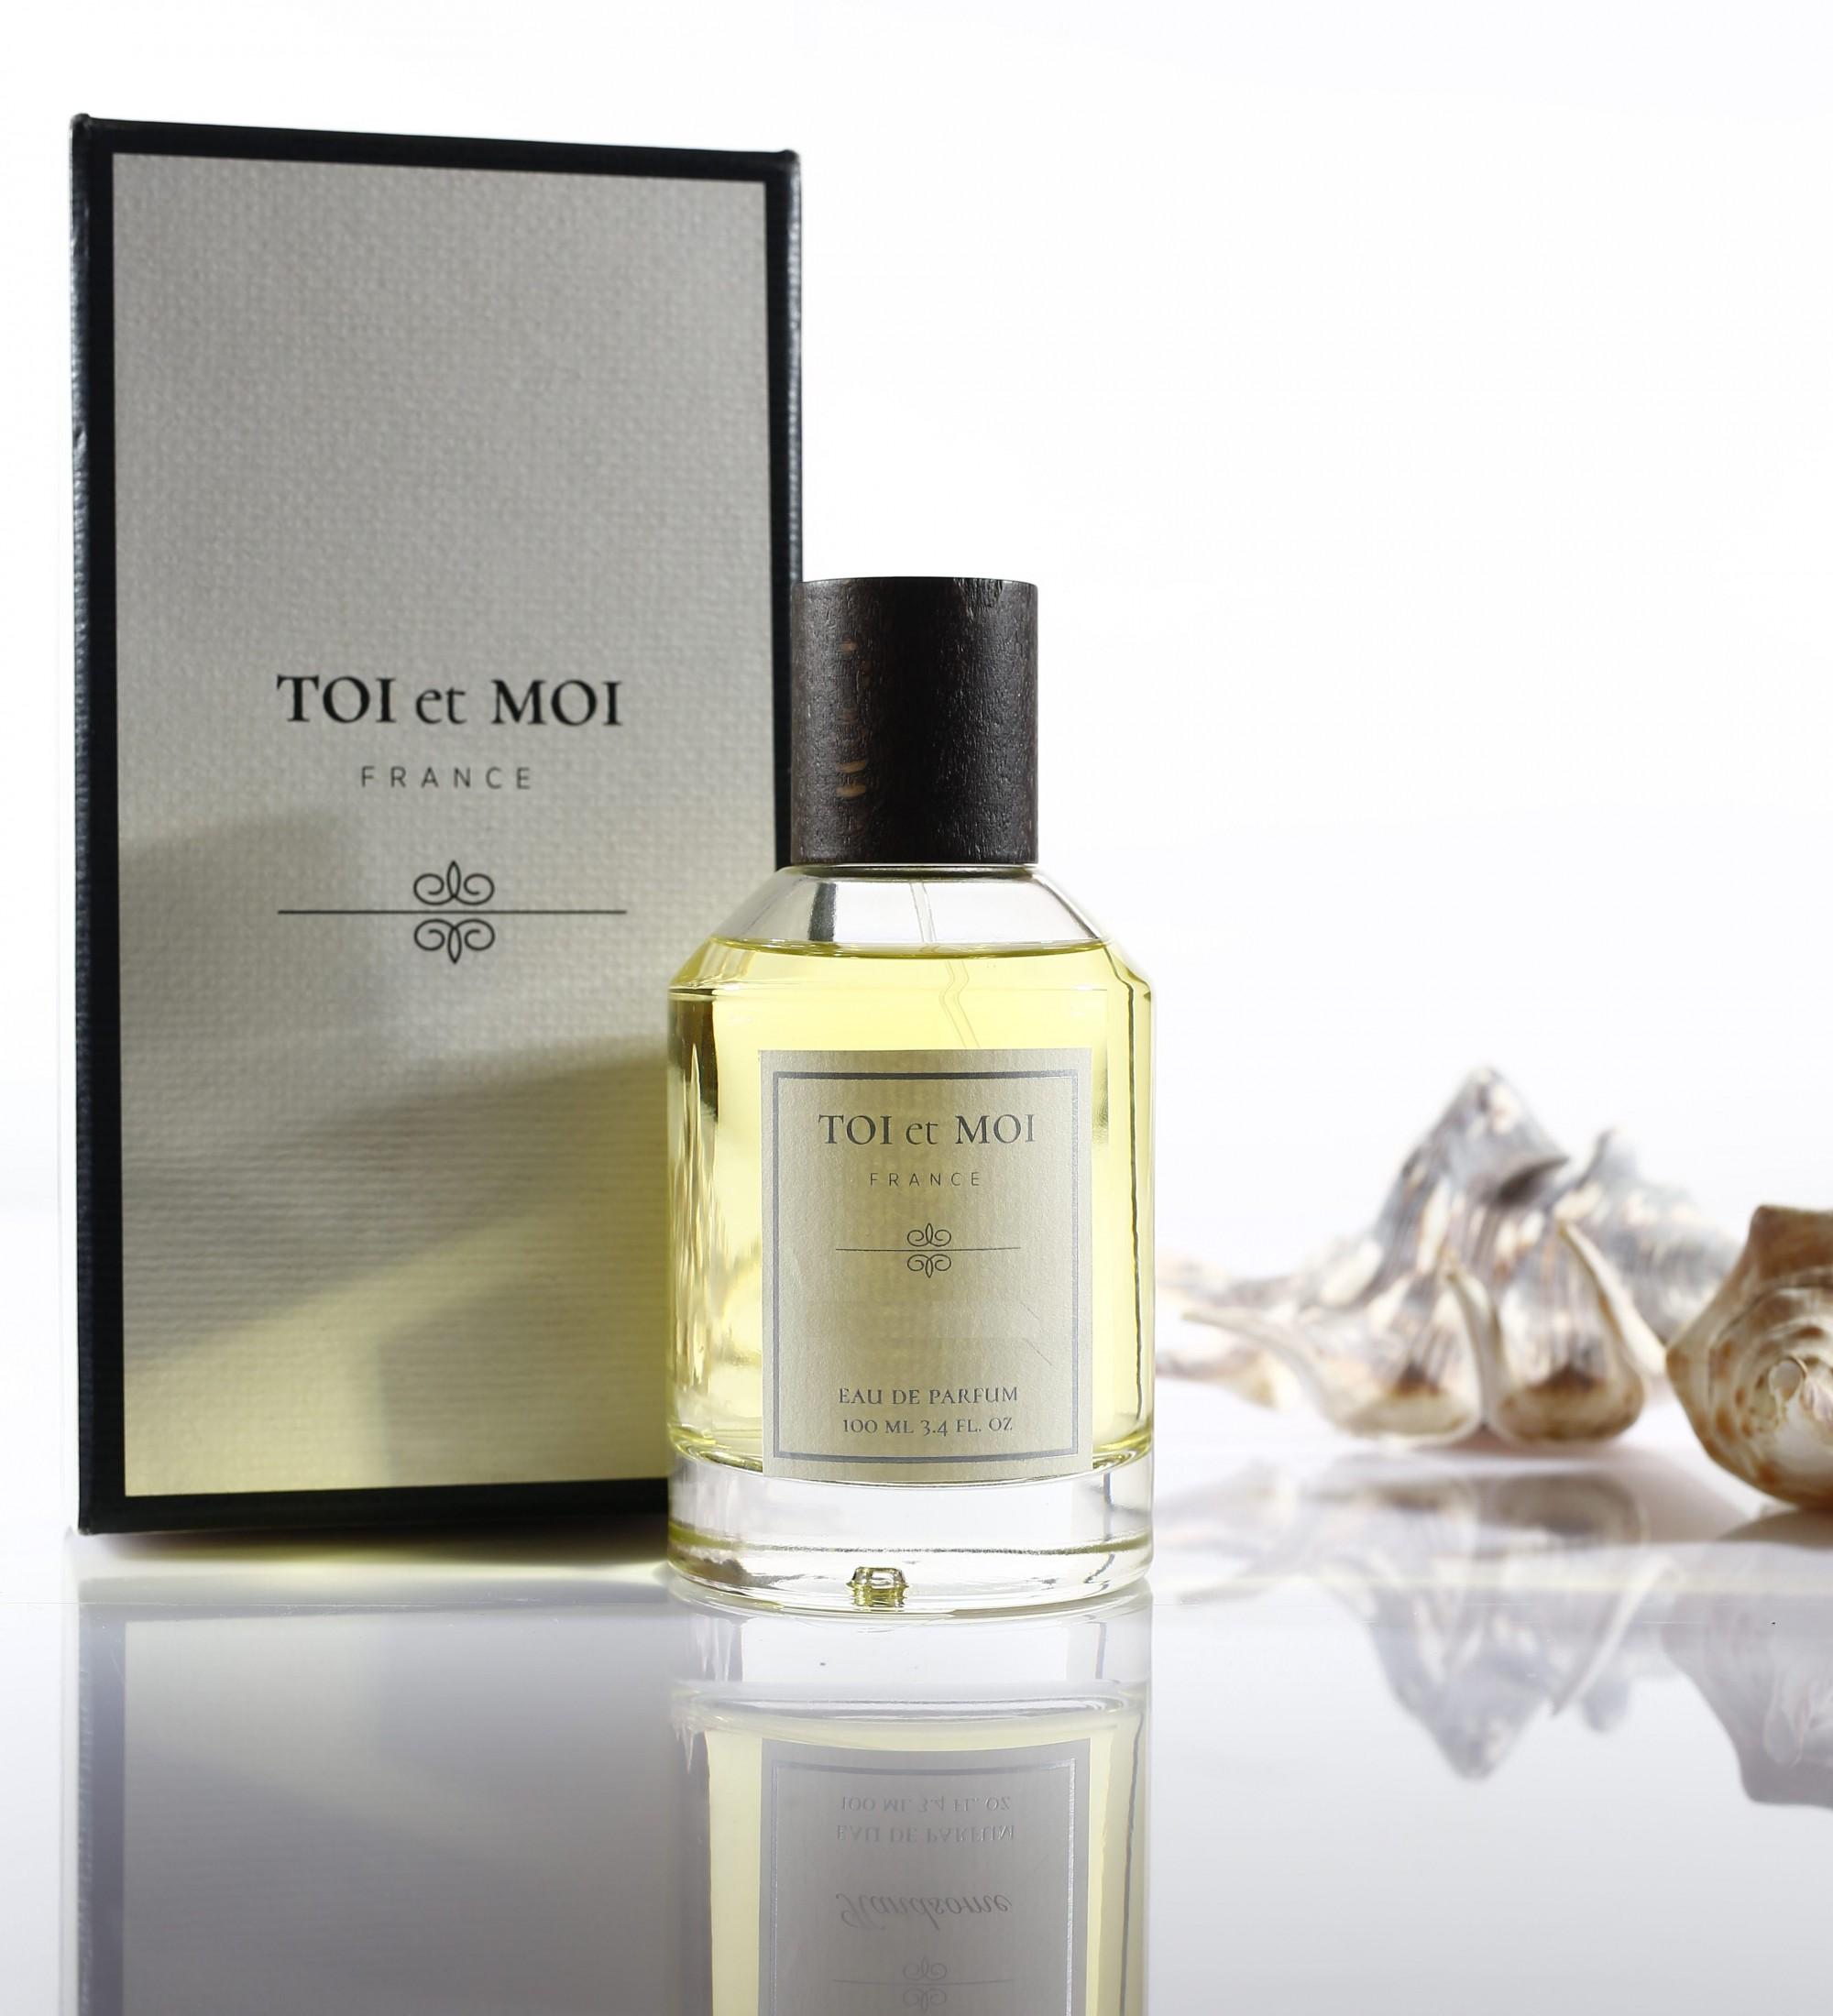 Toietmoi Men Parfum By Toi Ey Moi Eau De Parfum 100 ML. 3.4 Oz. Free Shipping